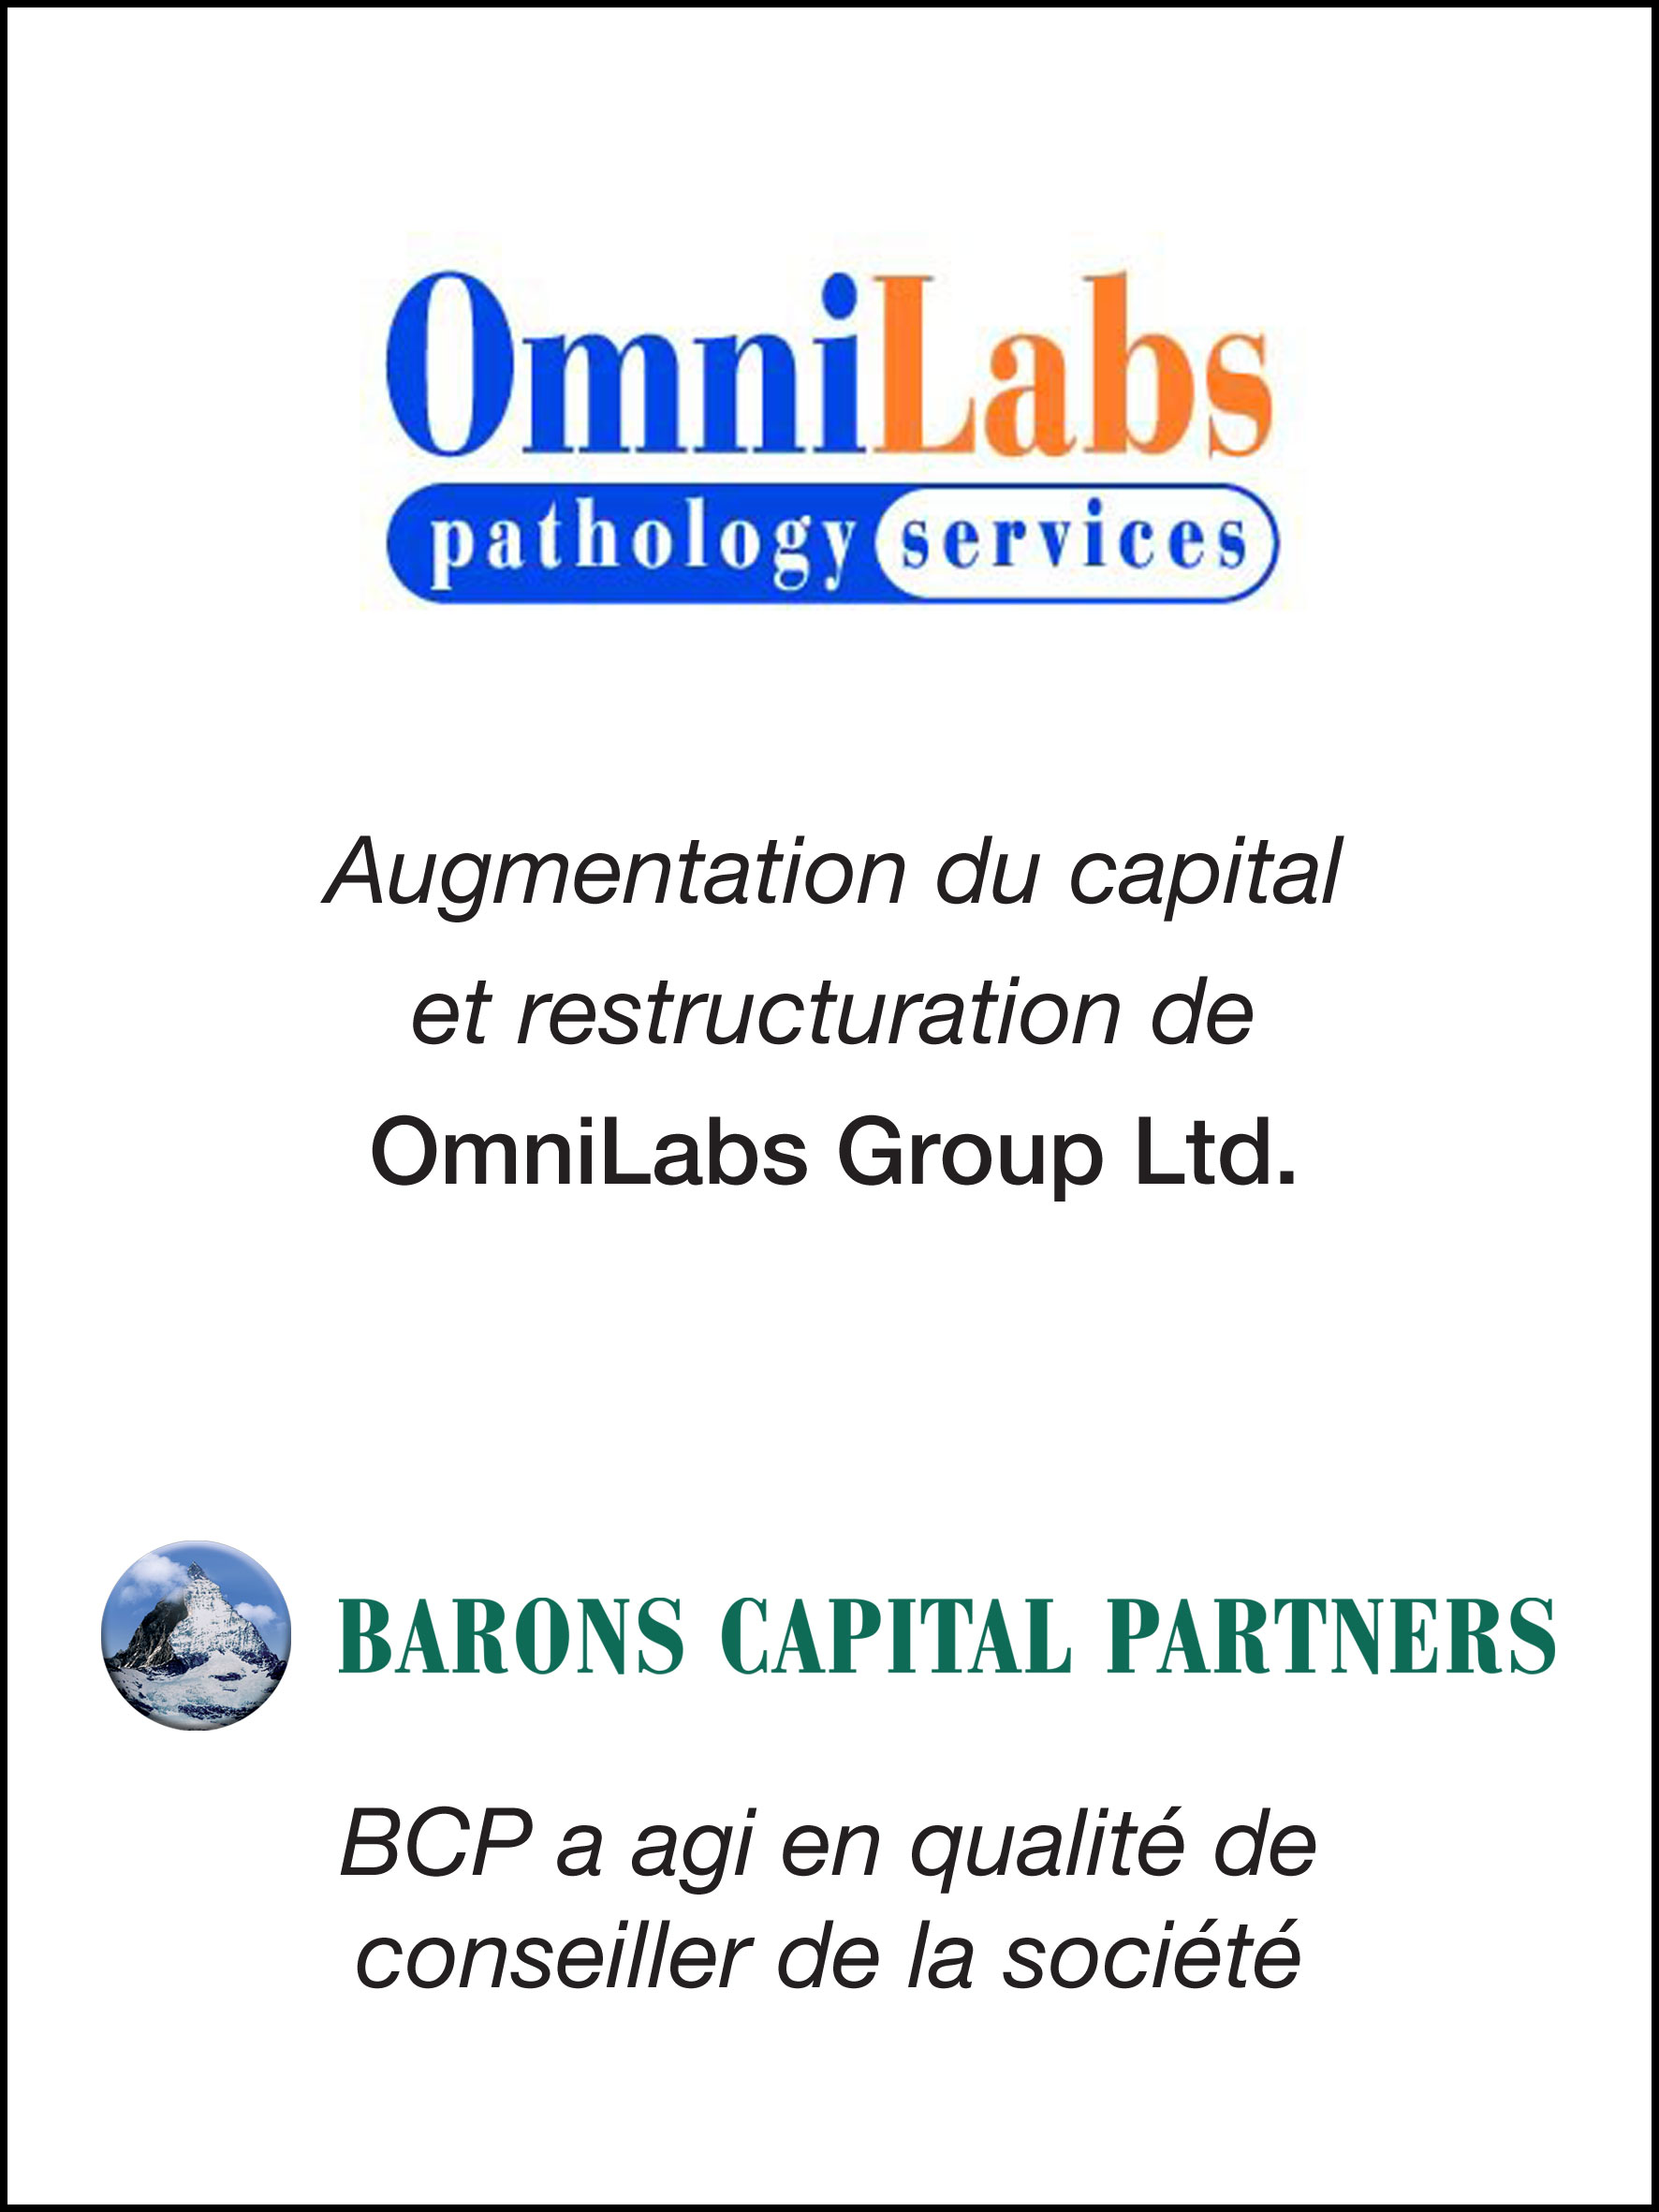 20_OmniLabs Group Ltd_F